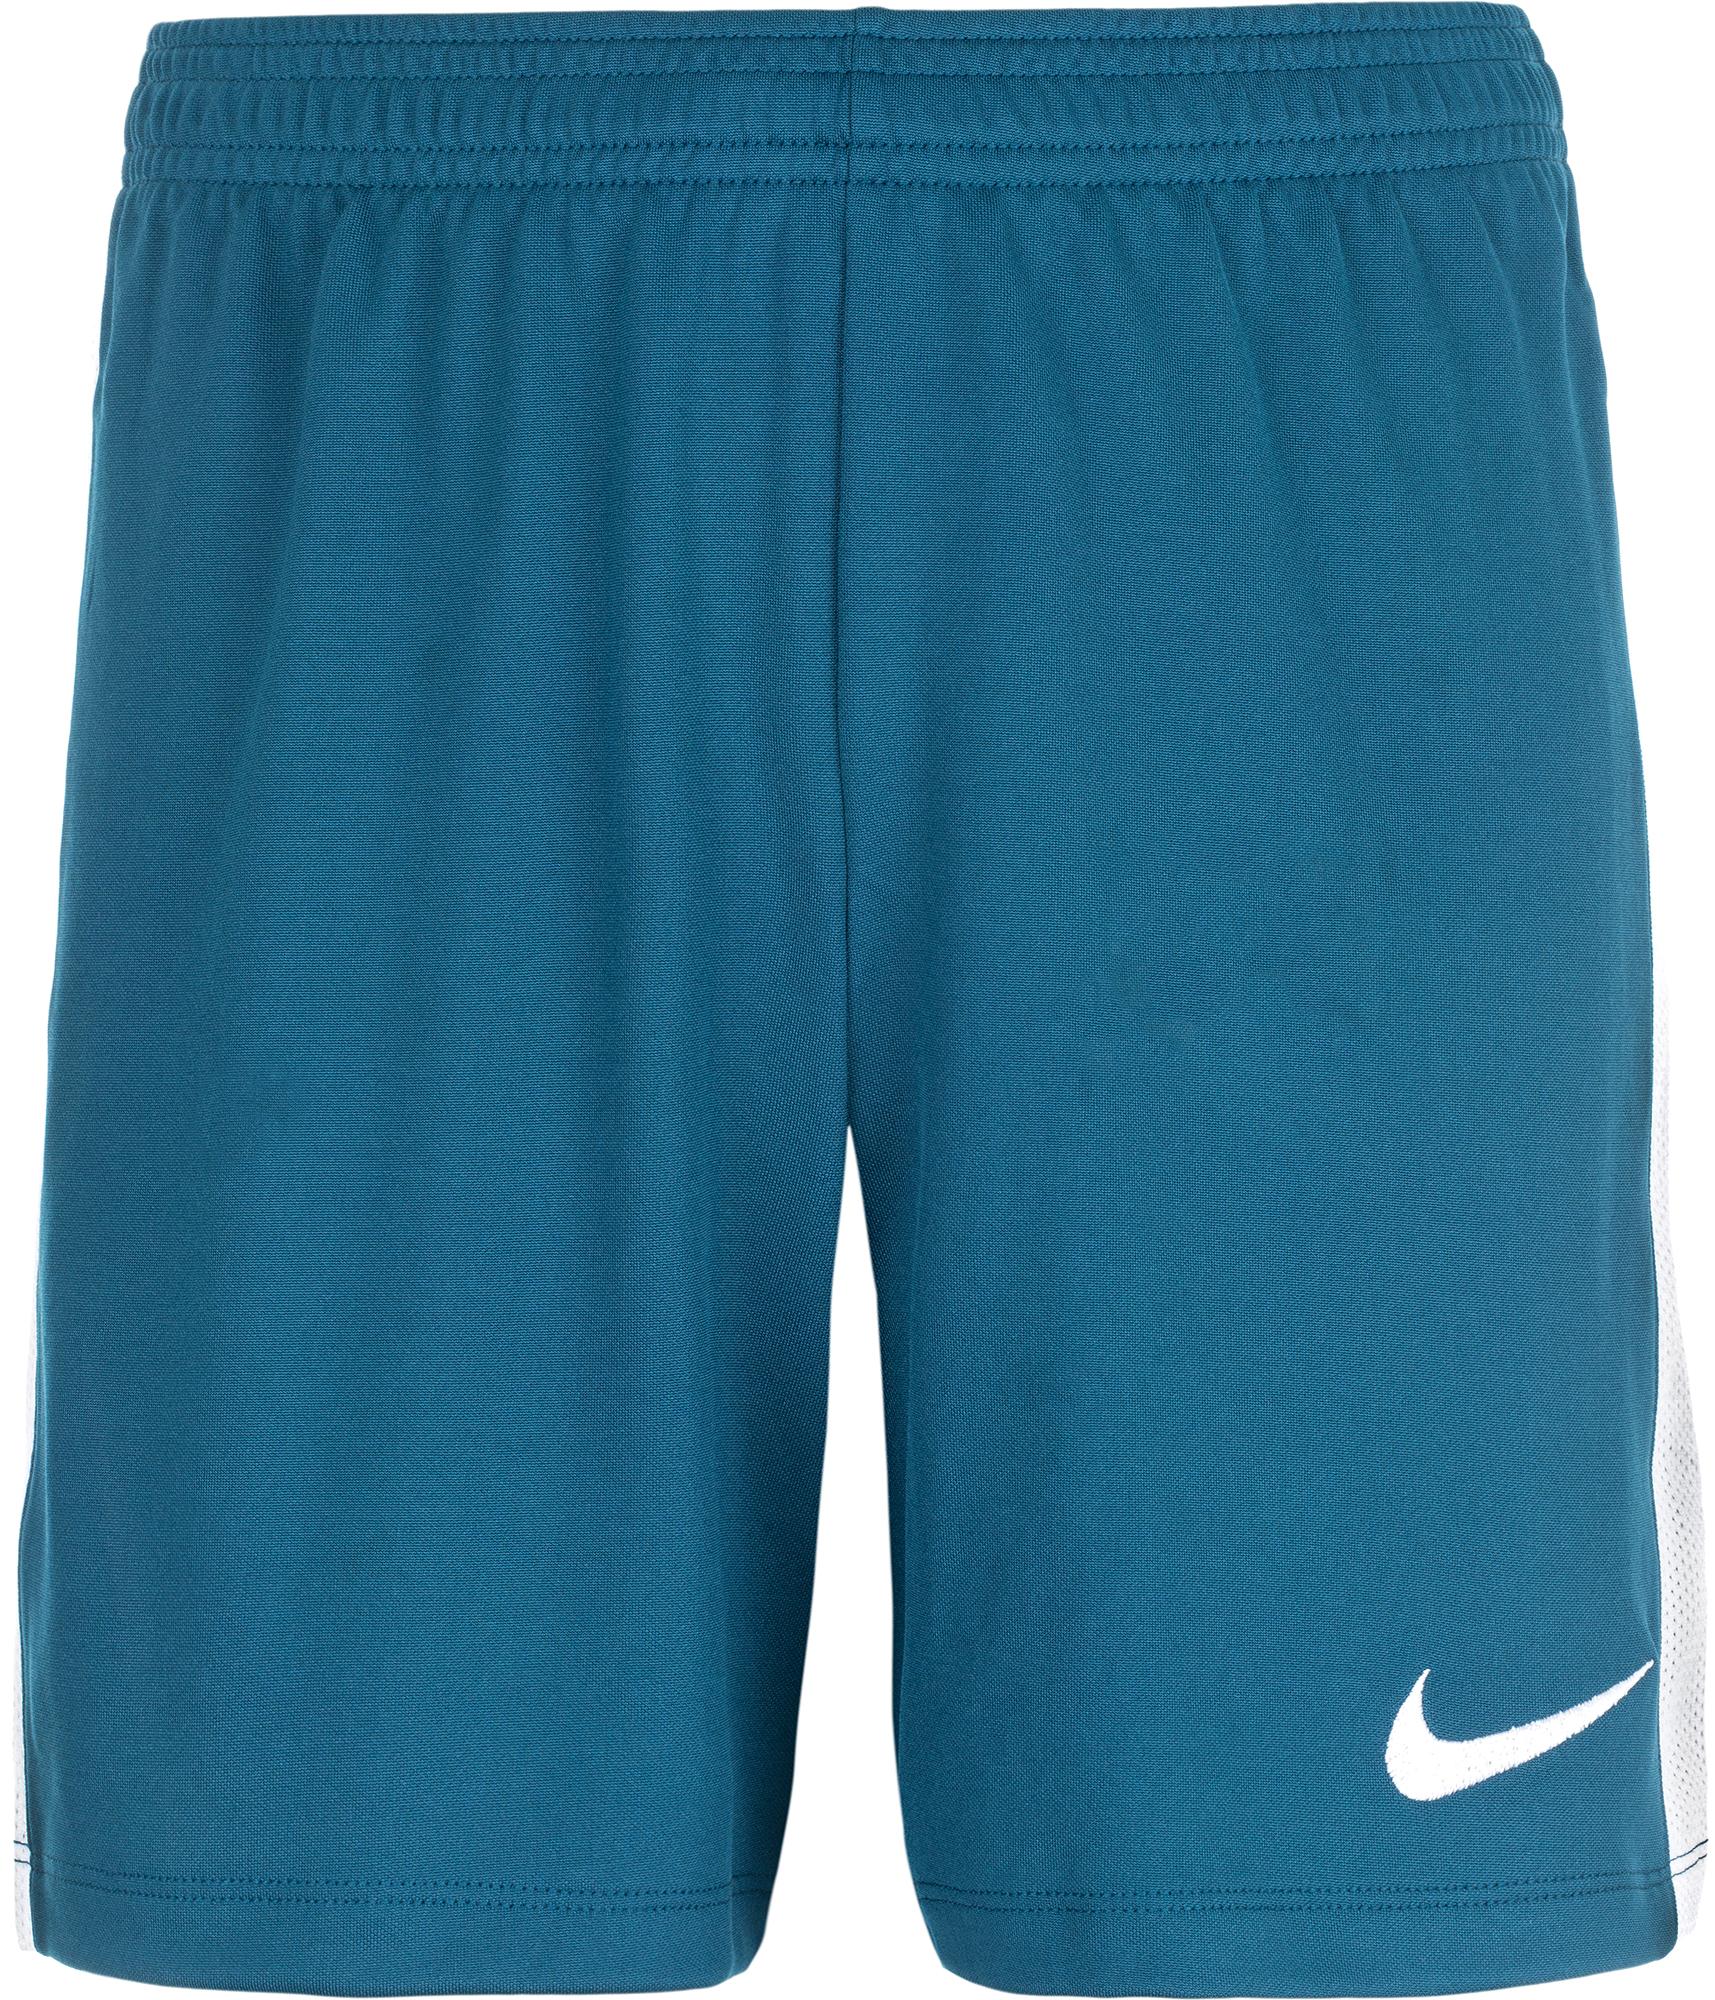 Nike Шорты для мальчиков Nike Dry nike брюки для мальчиков nike dry